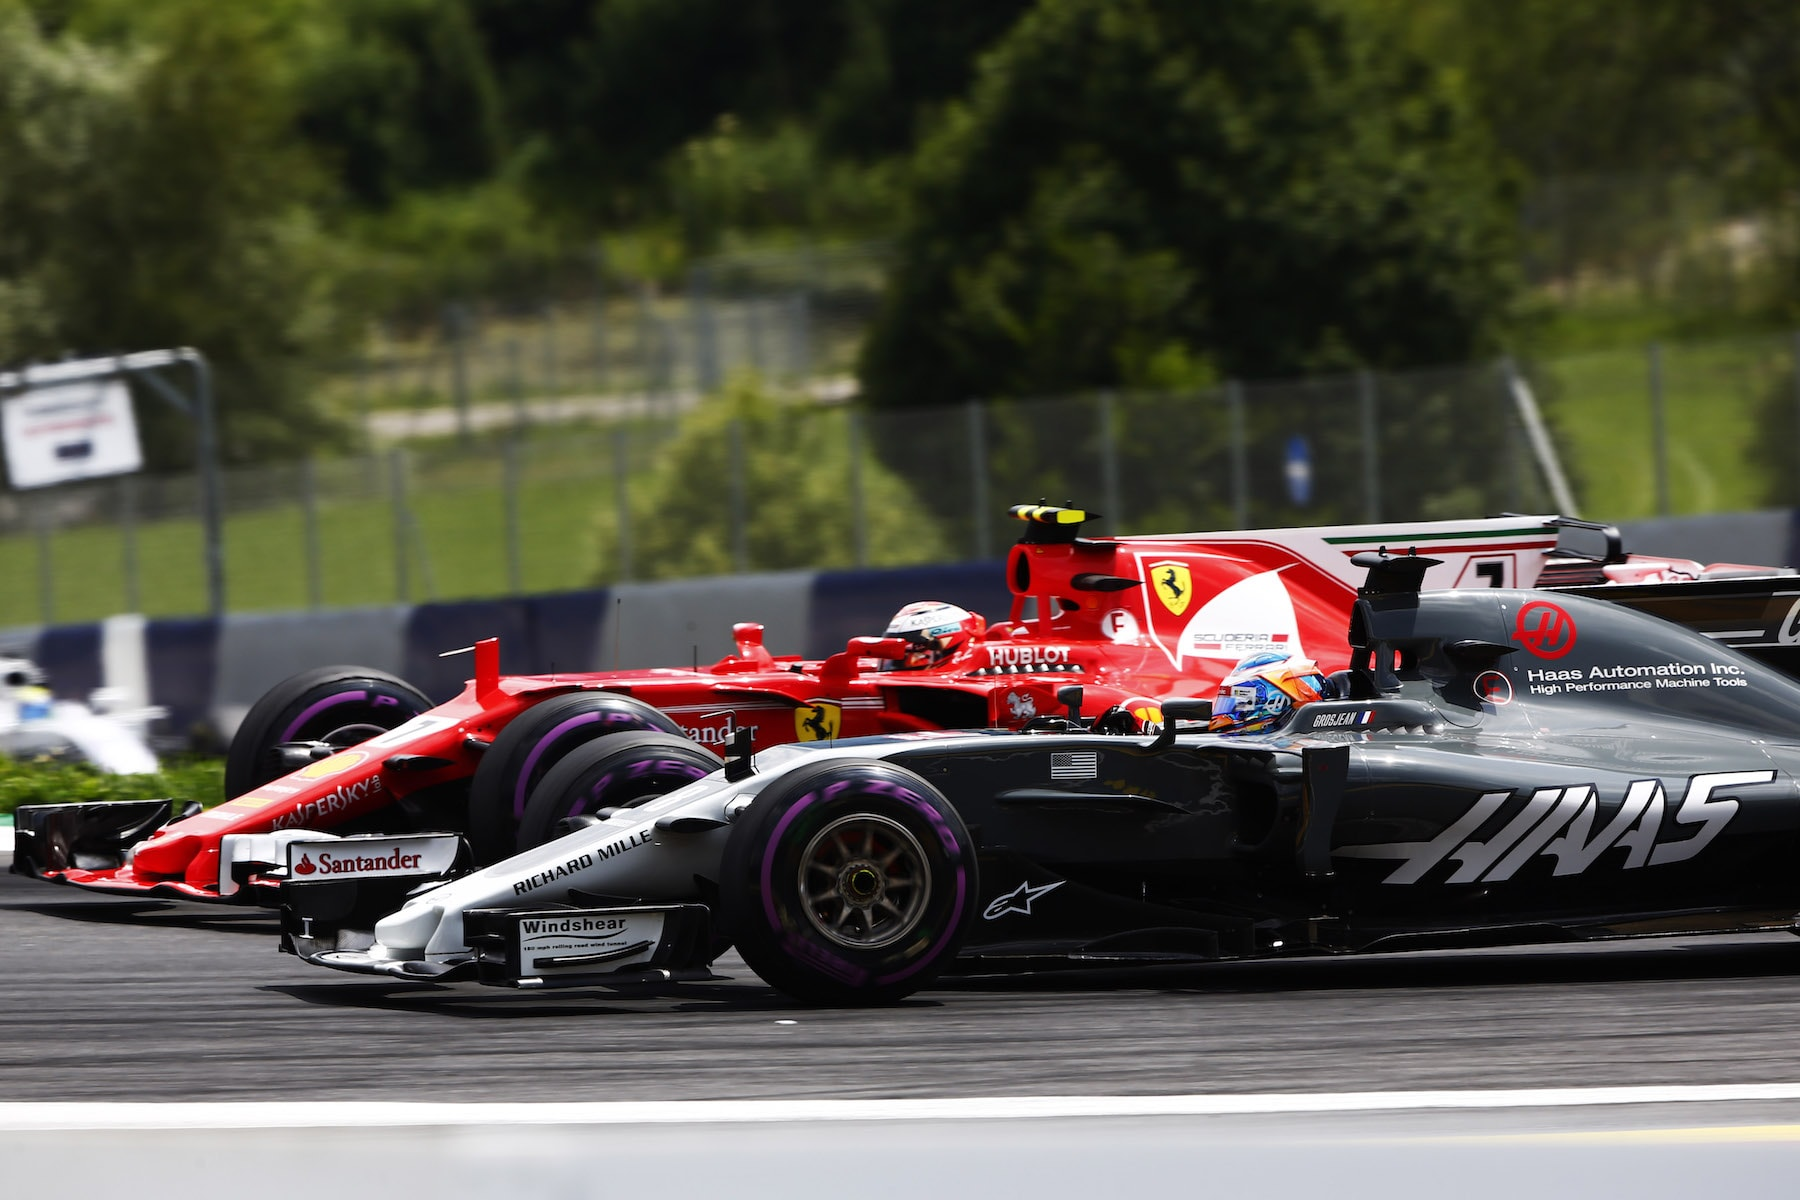 D 2017 Ferrari cousins | 2017 Austrian GP 1 copy.jpg